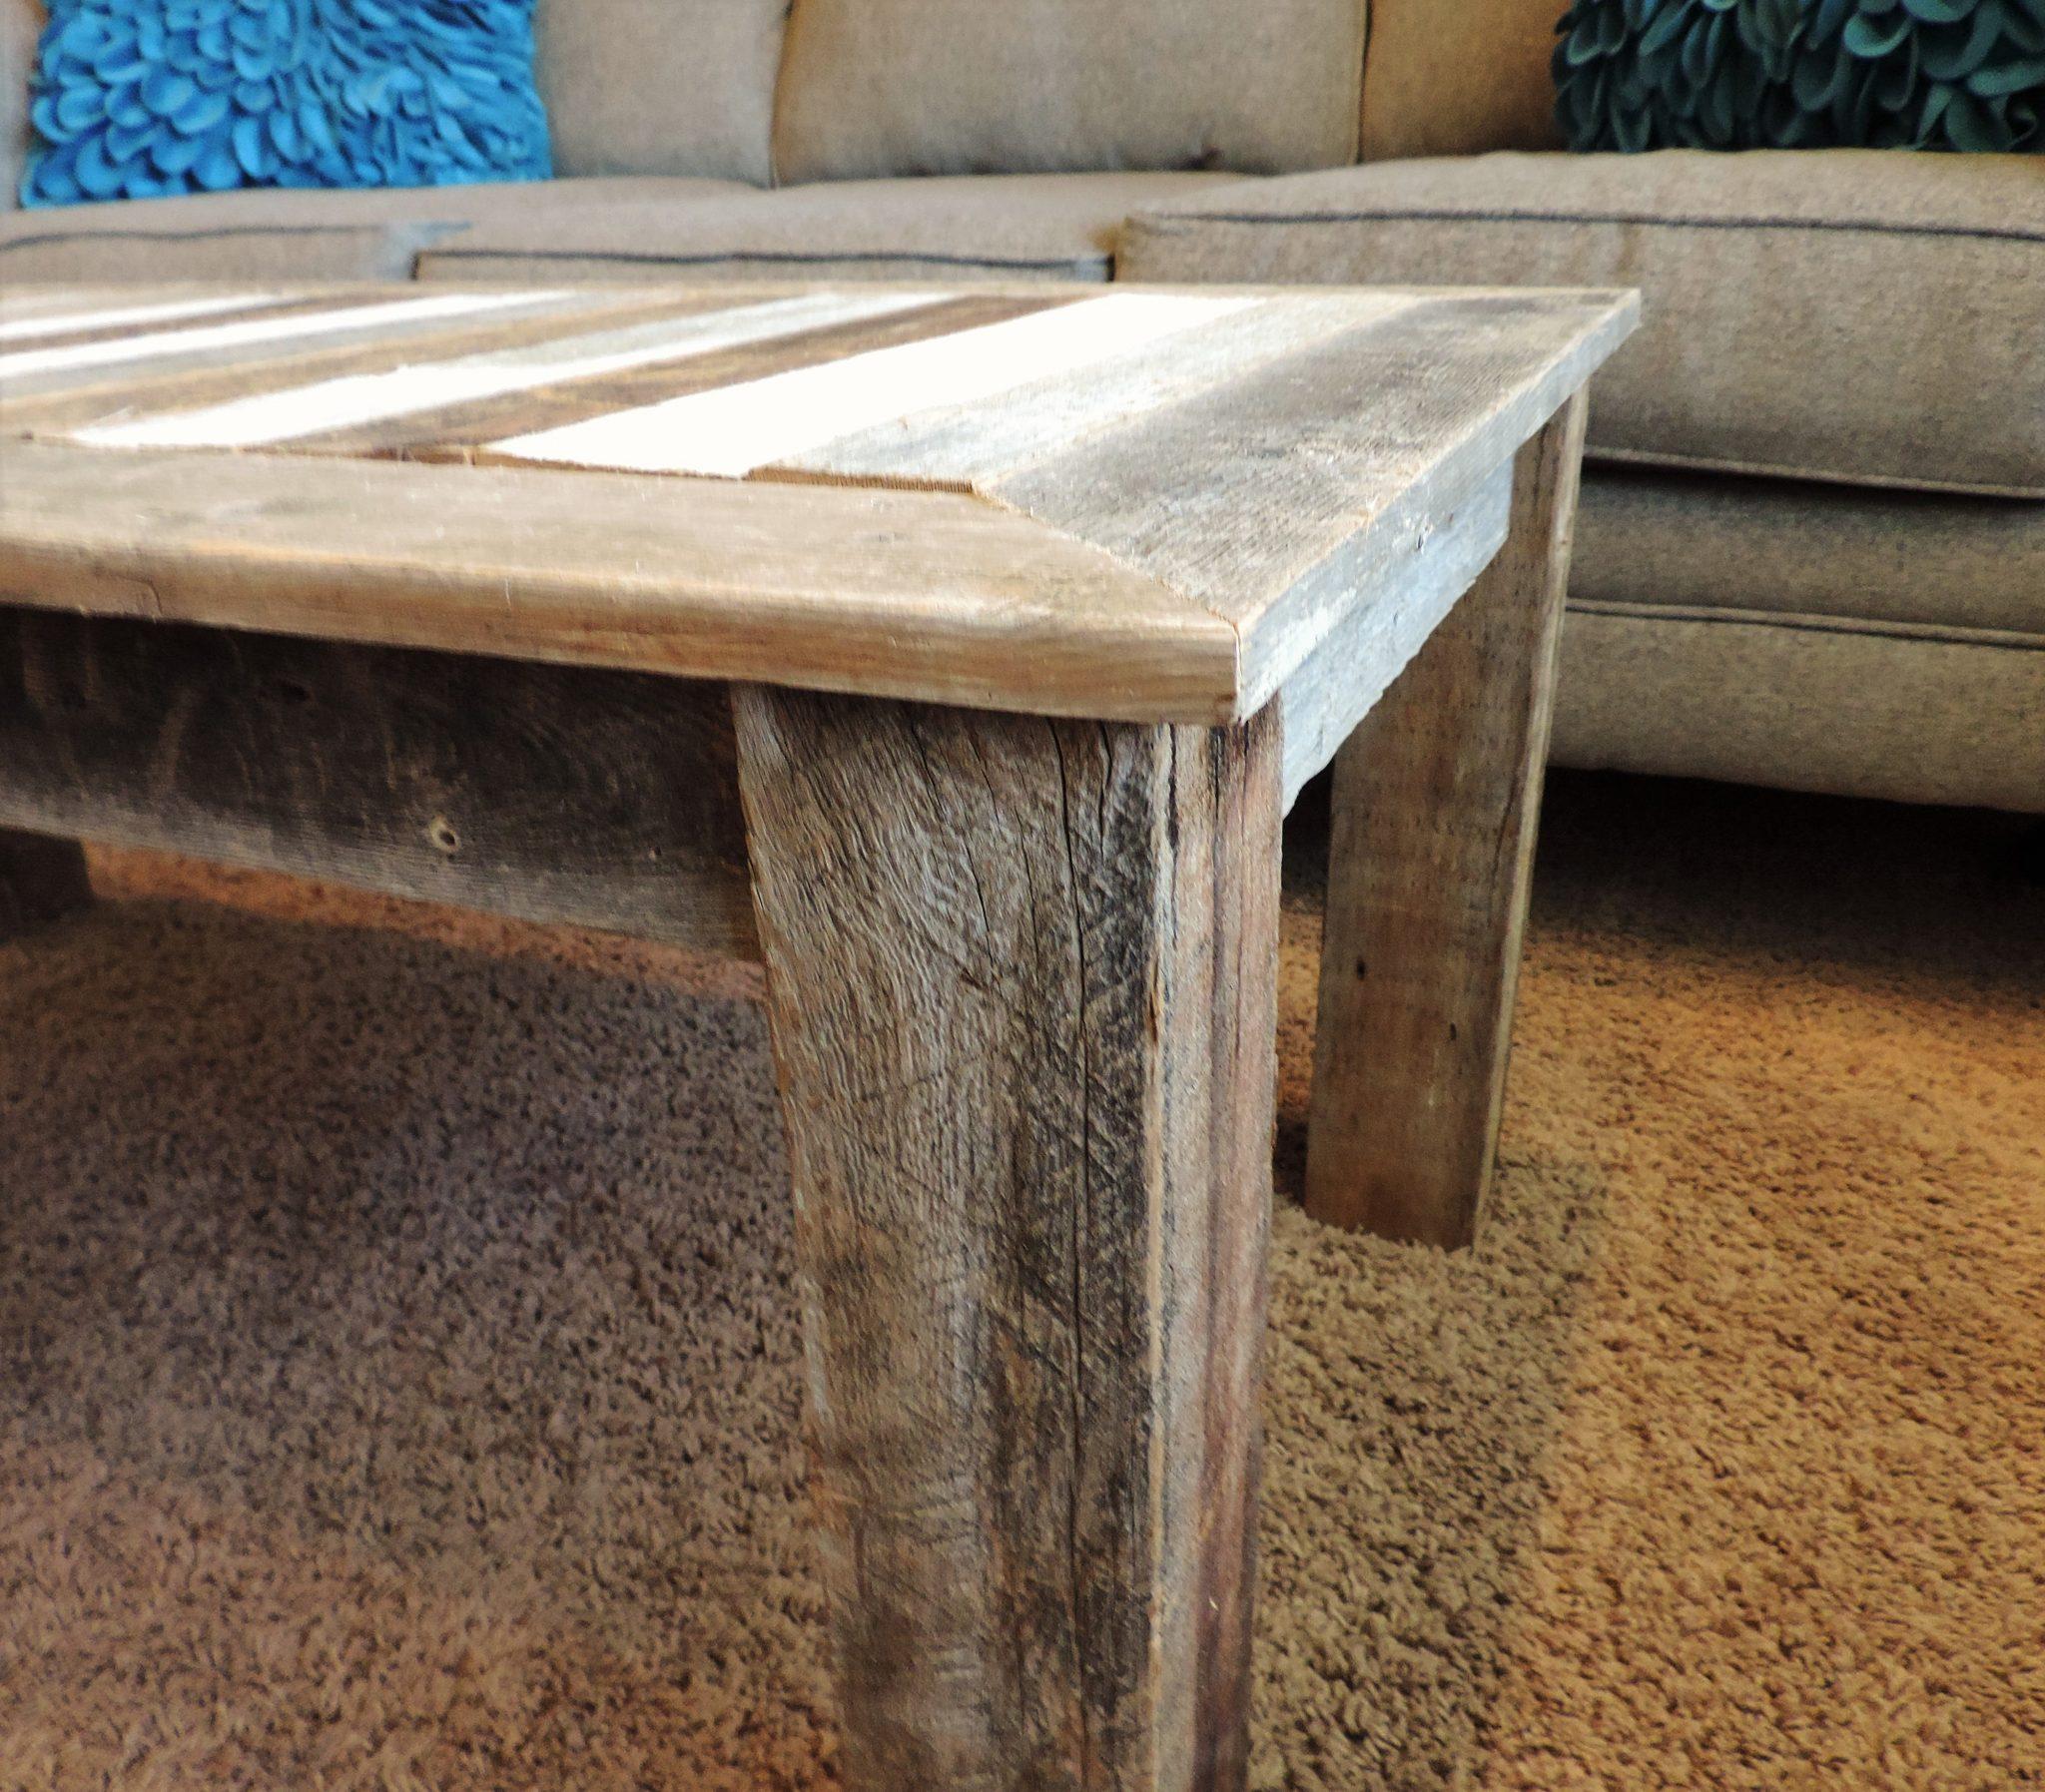 24 in x 48 in x 18 in bretton style reclaimed wood rustic barnwood coffee table allbarnwood